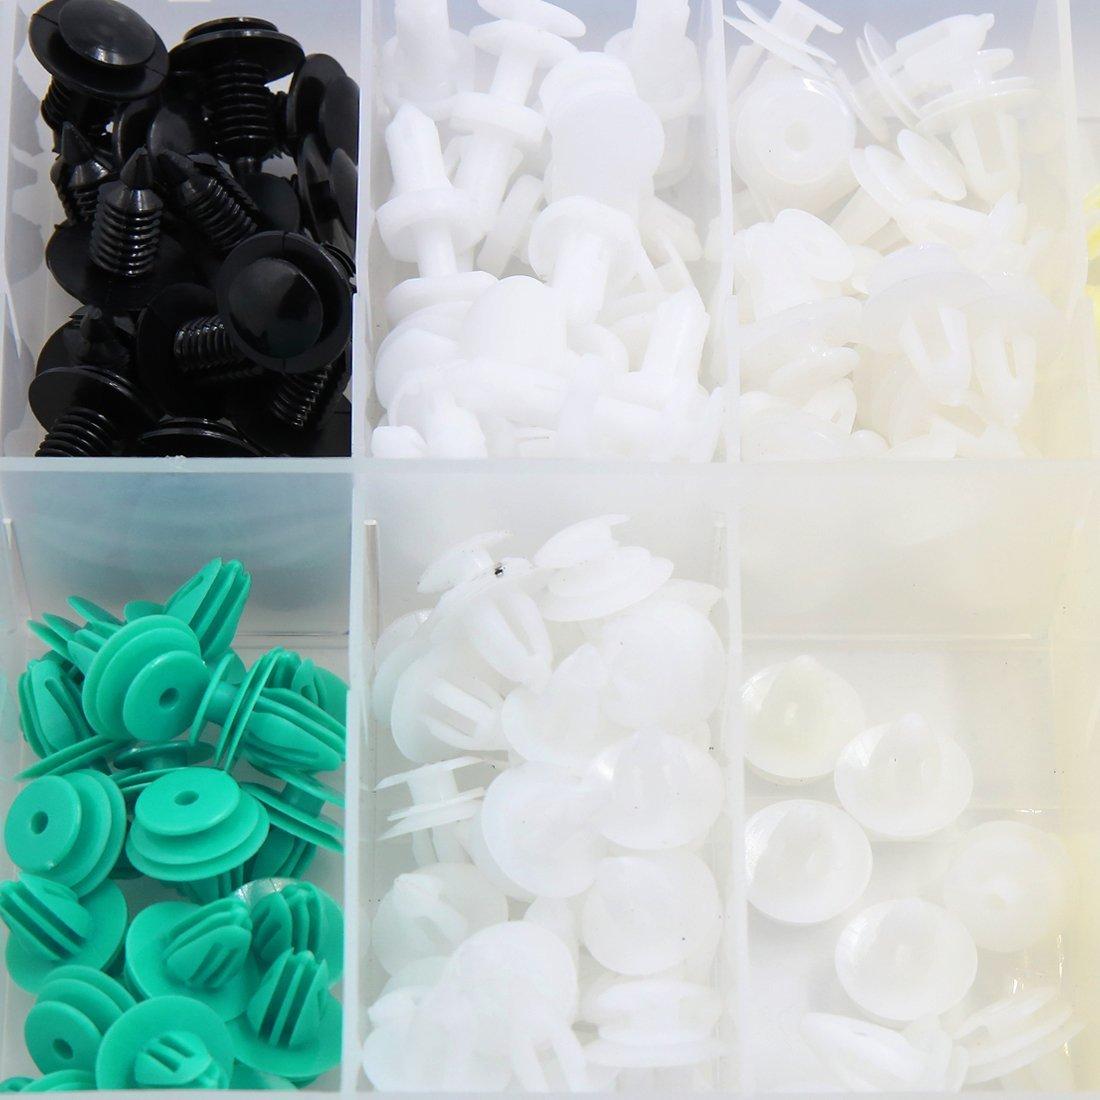 Amazon.com: eDealMax 210 Pcs 10 Tipo de plástico auto de choque Remaches contacto del empuje burletes de moldeo Sujetador Clip: Automotive